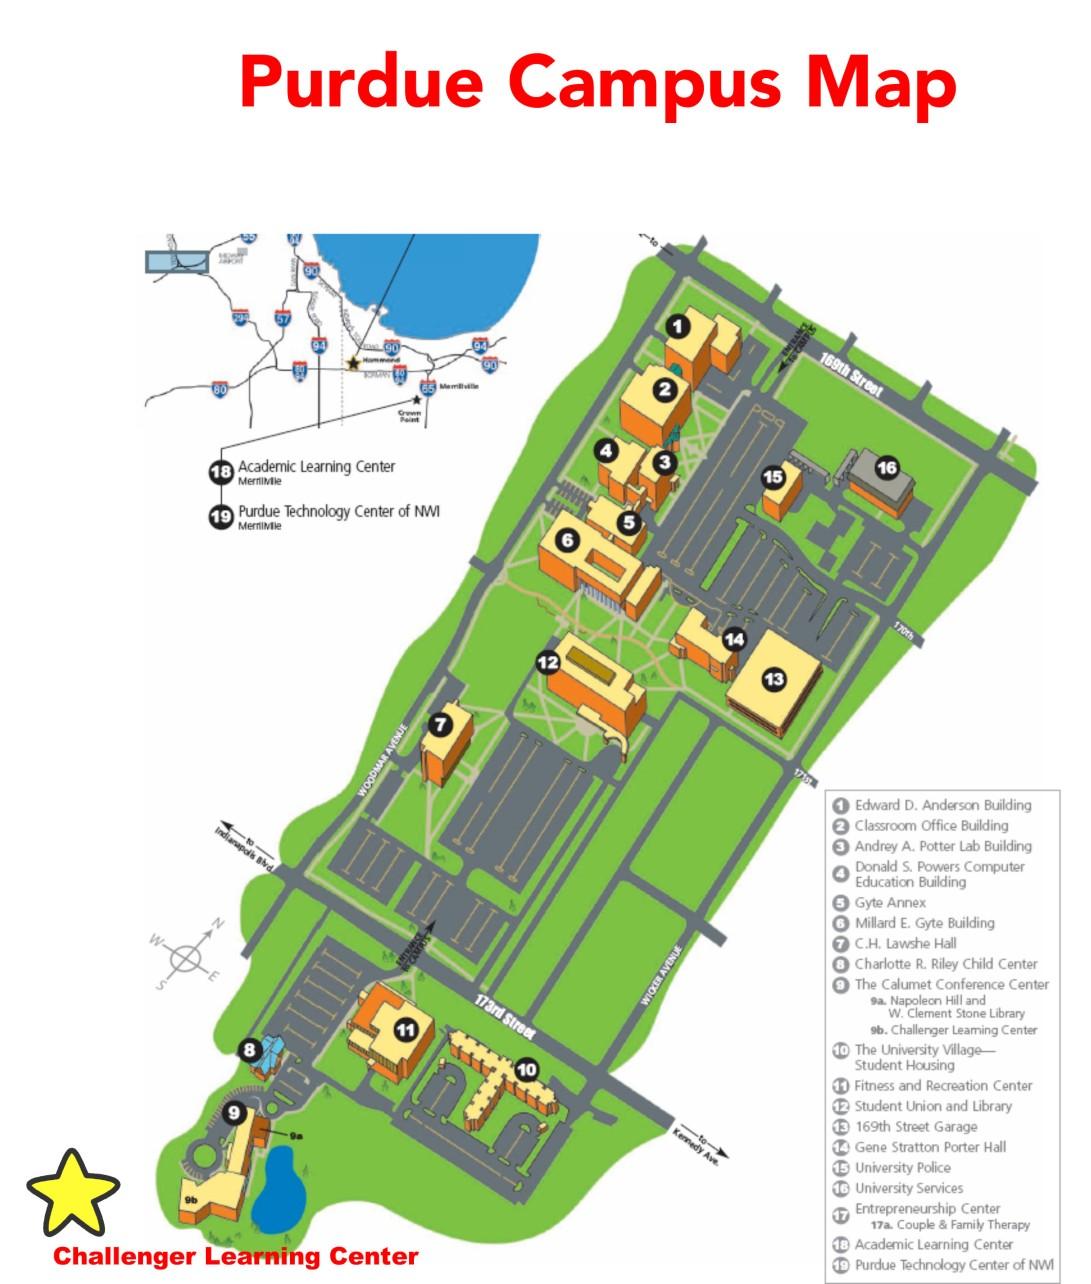 purdue calumet campus map Directions To Challenger Center Challenger Mission Training purdue calumet campus map